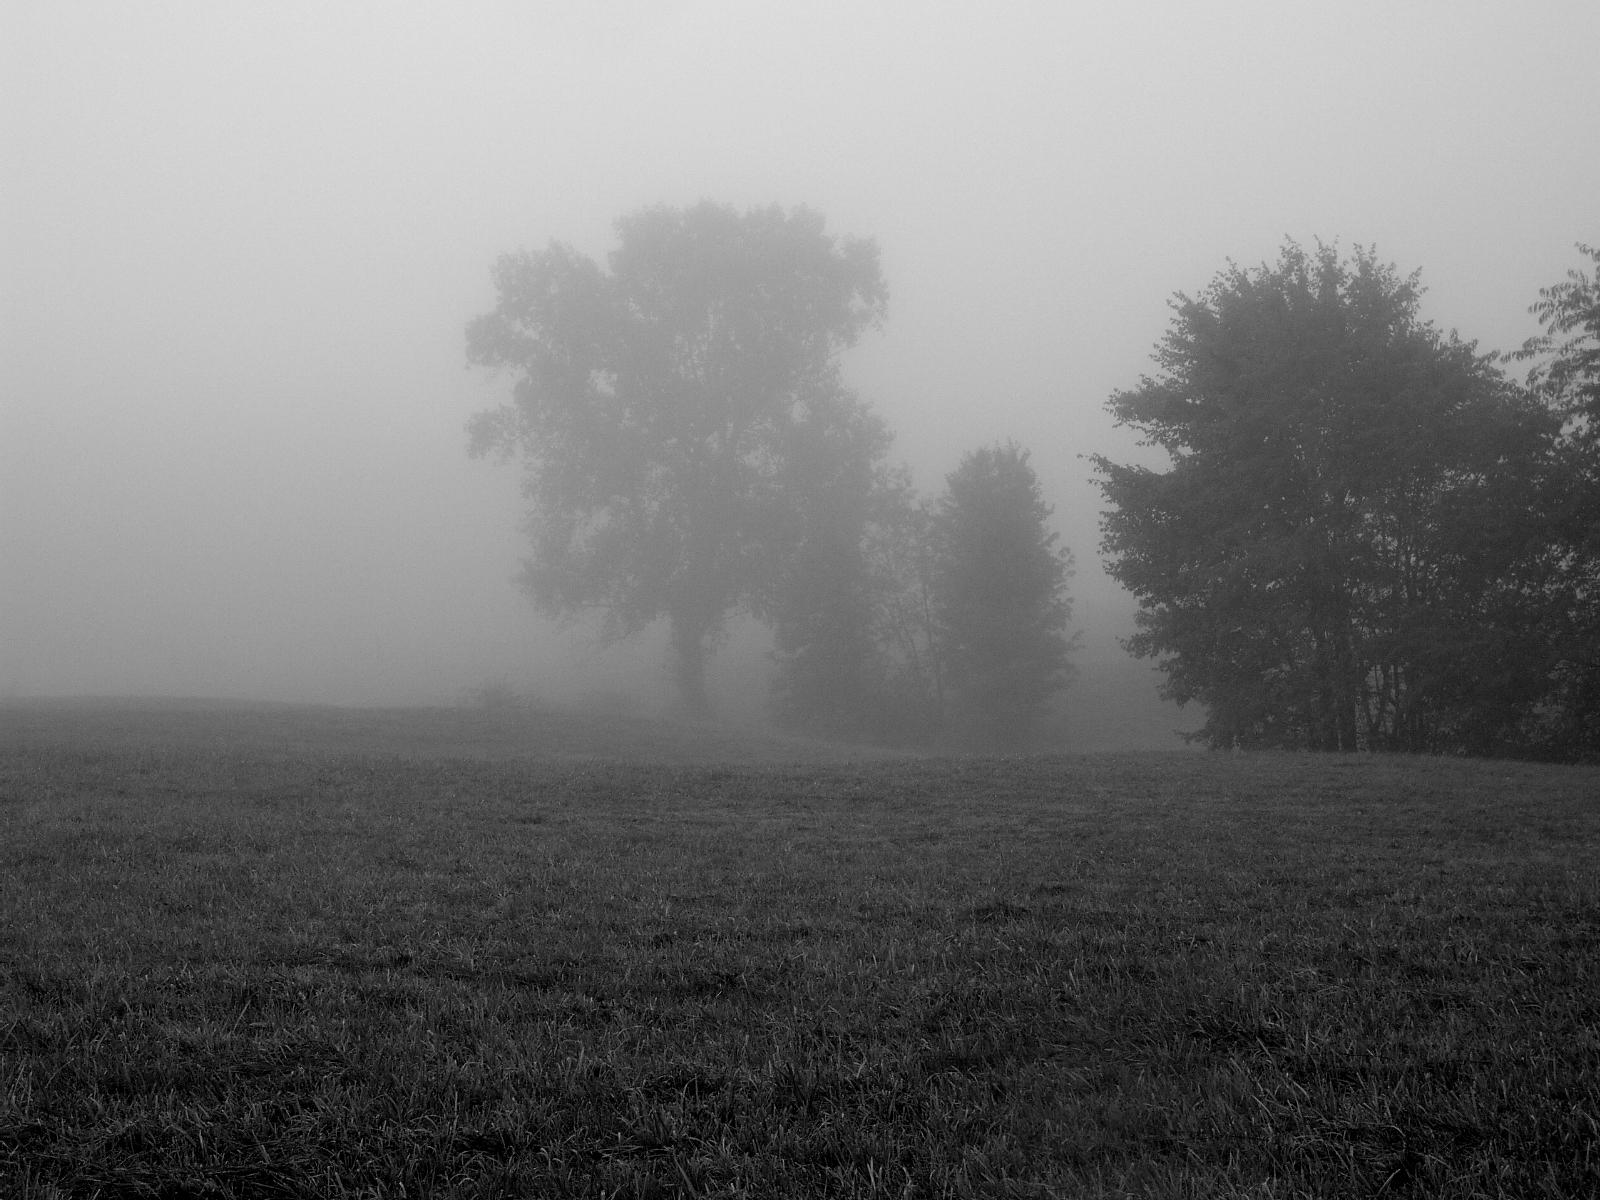 S.S. Foggy Scene - 1